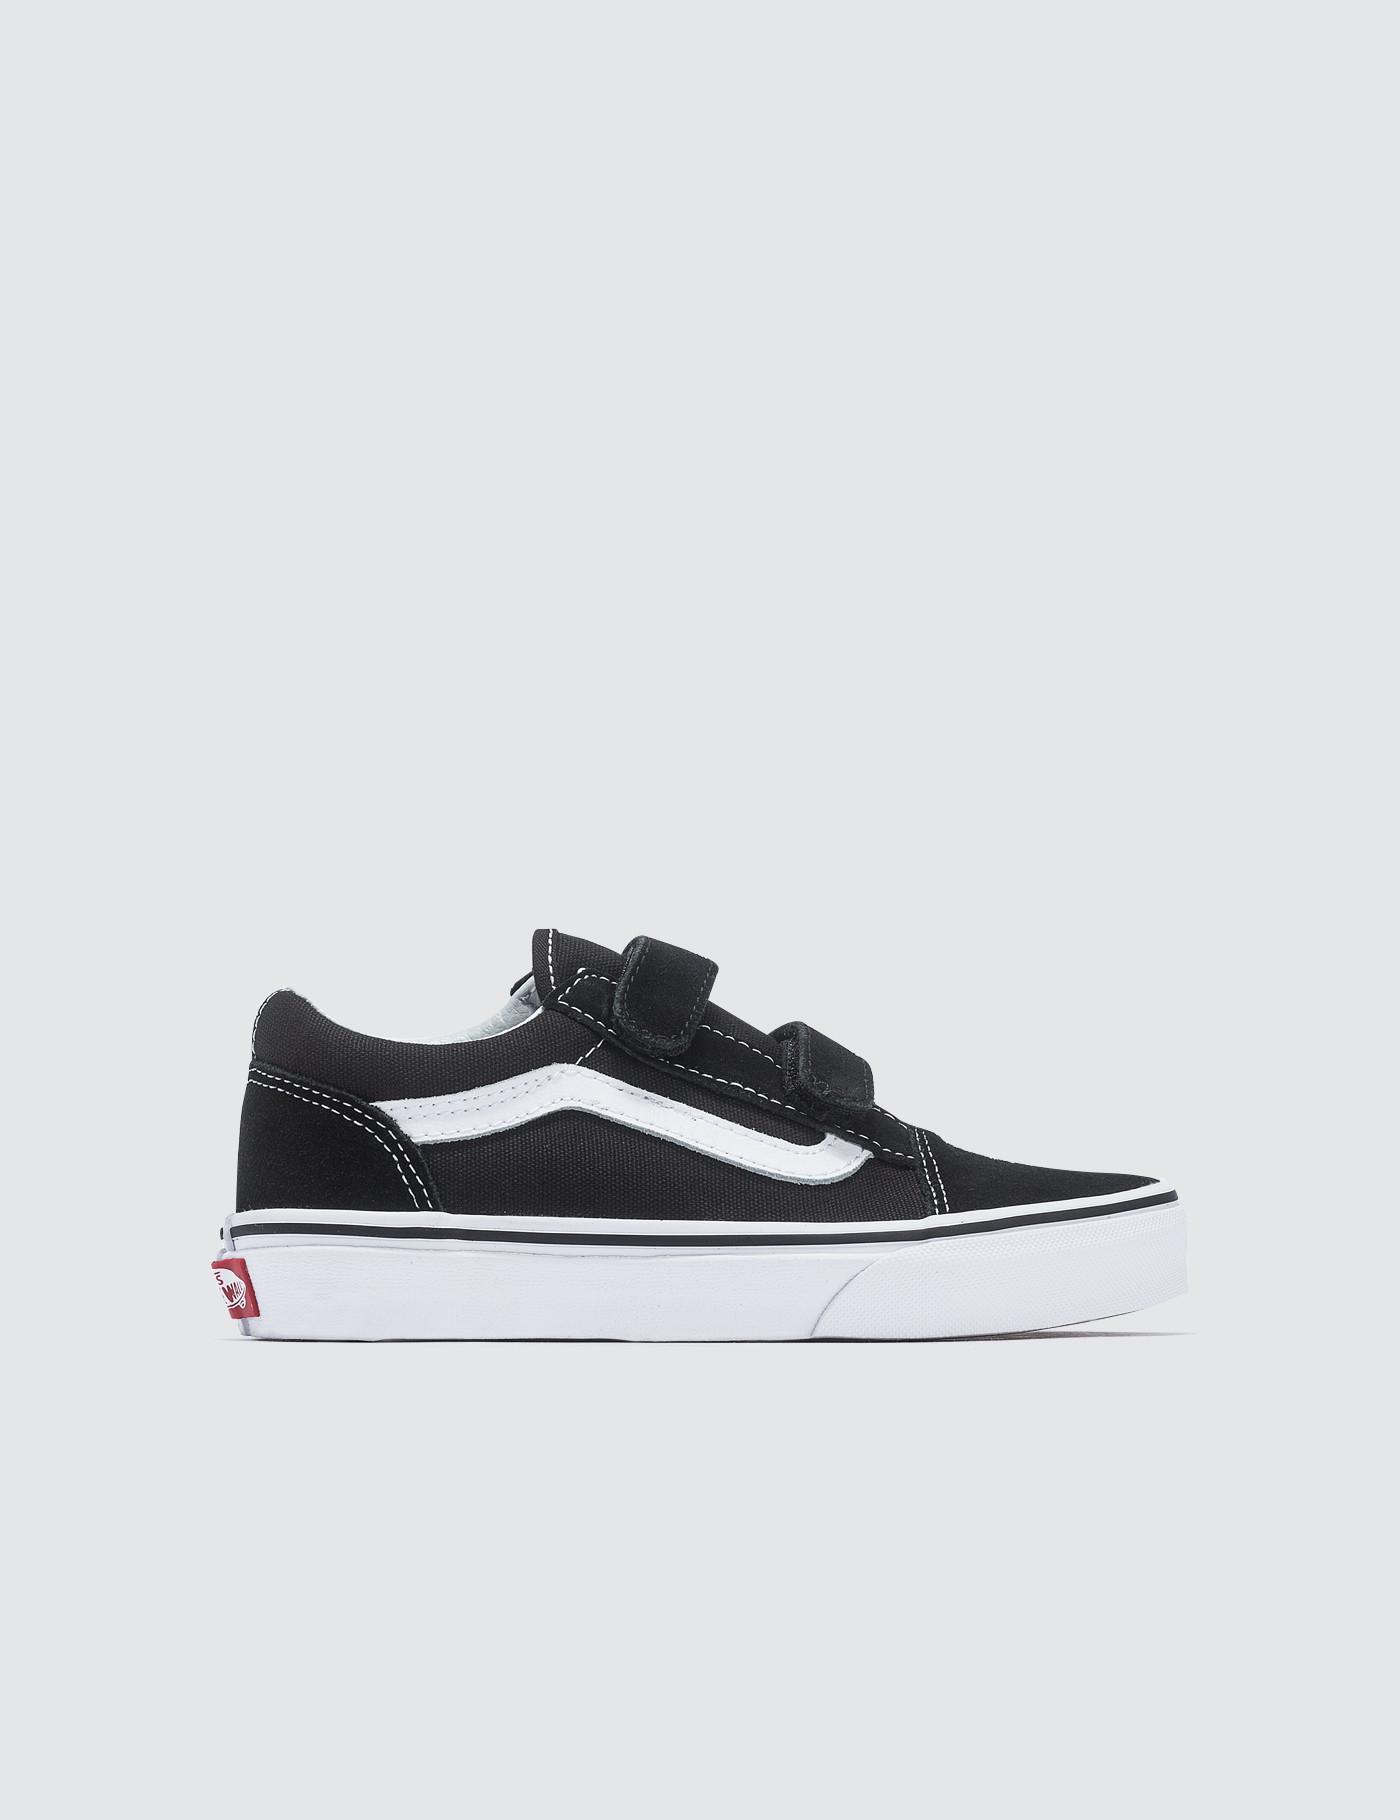 Vans Old Skool V in Black for Men - Lyst 68f9596c0